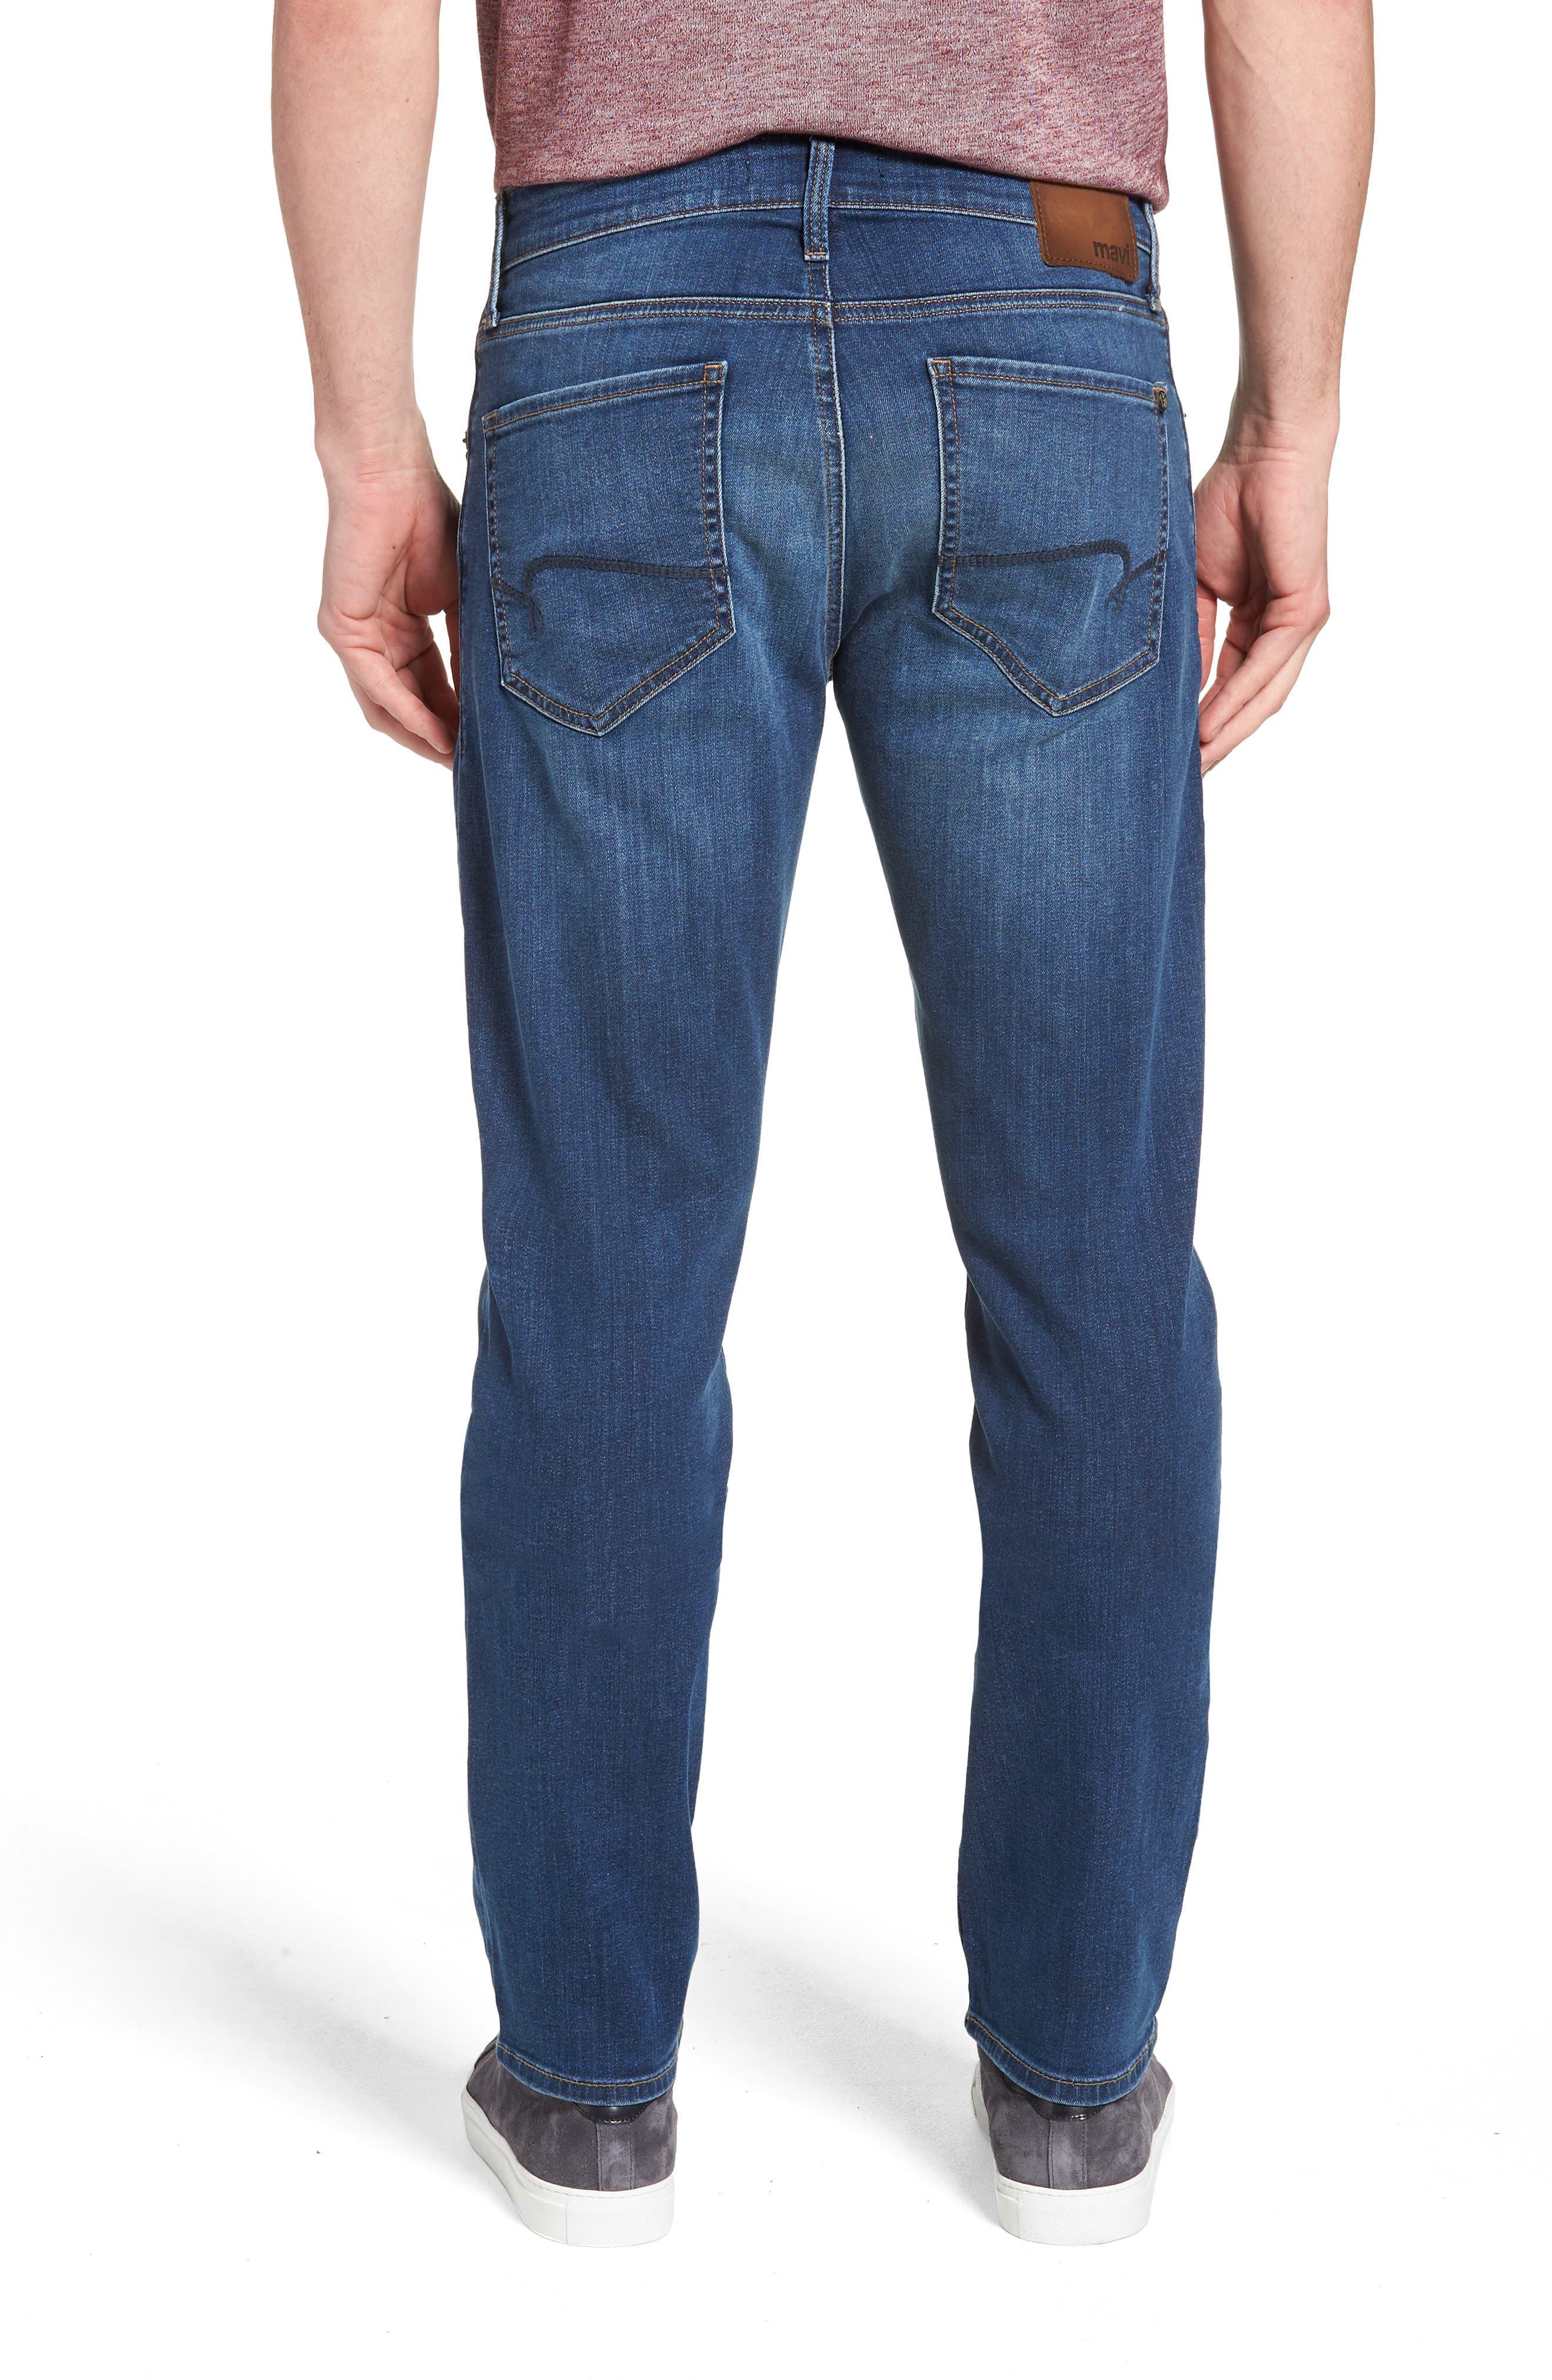 MAVI JEANS, Zach Straight Leg Jeans, Alternate thumbnail 2, color, DARK USED CAPITOL HILL